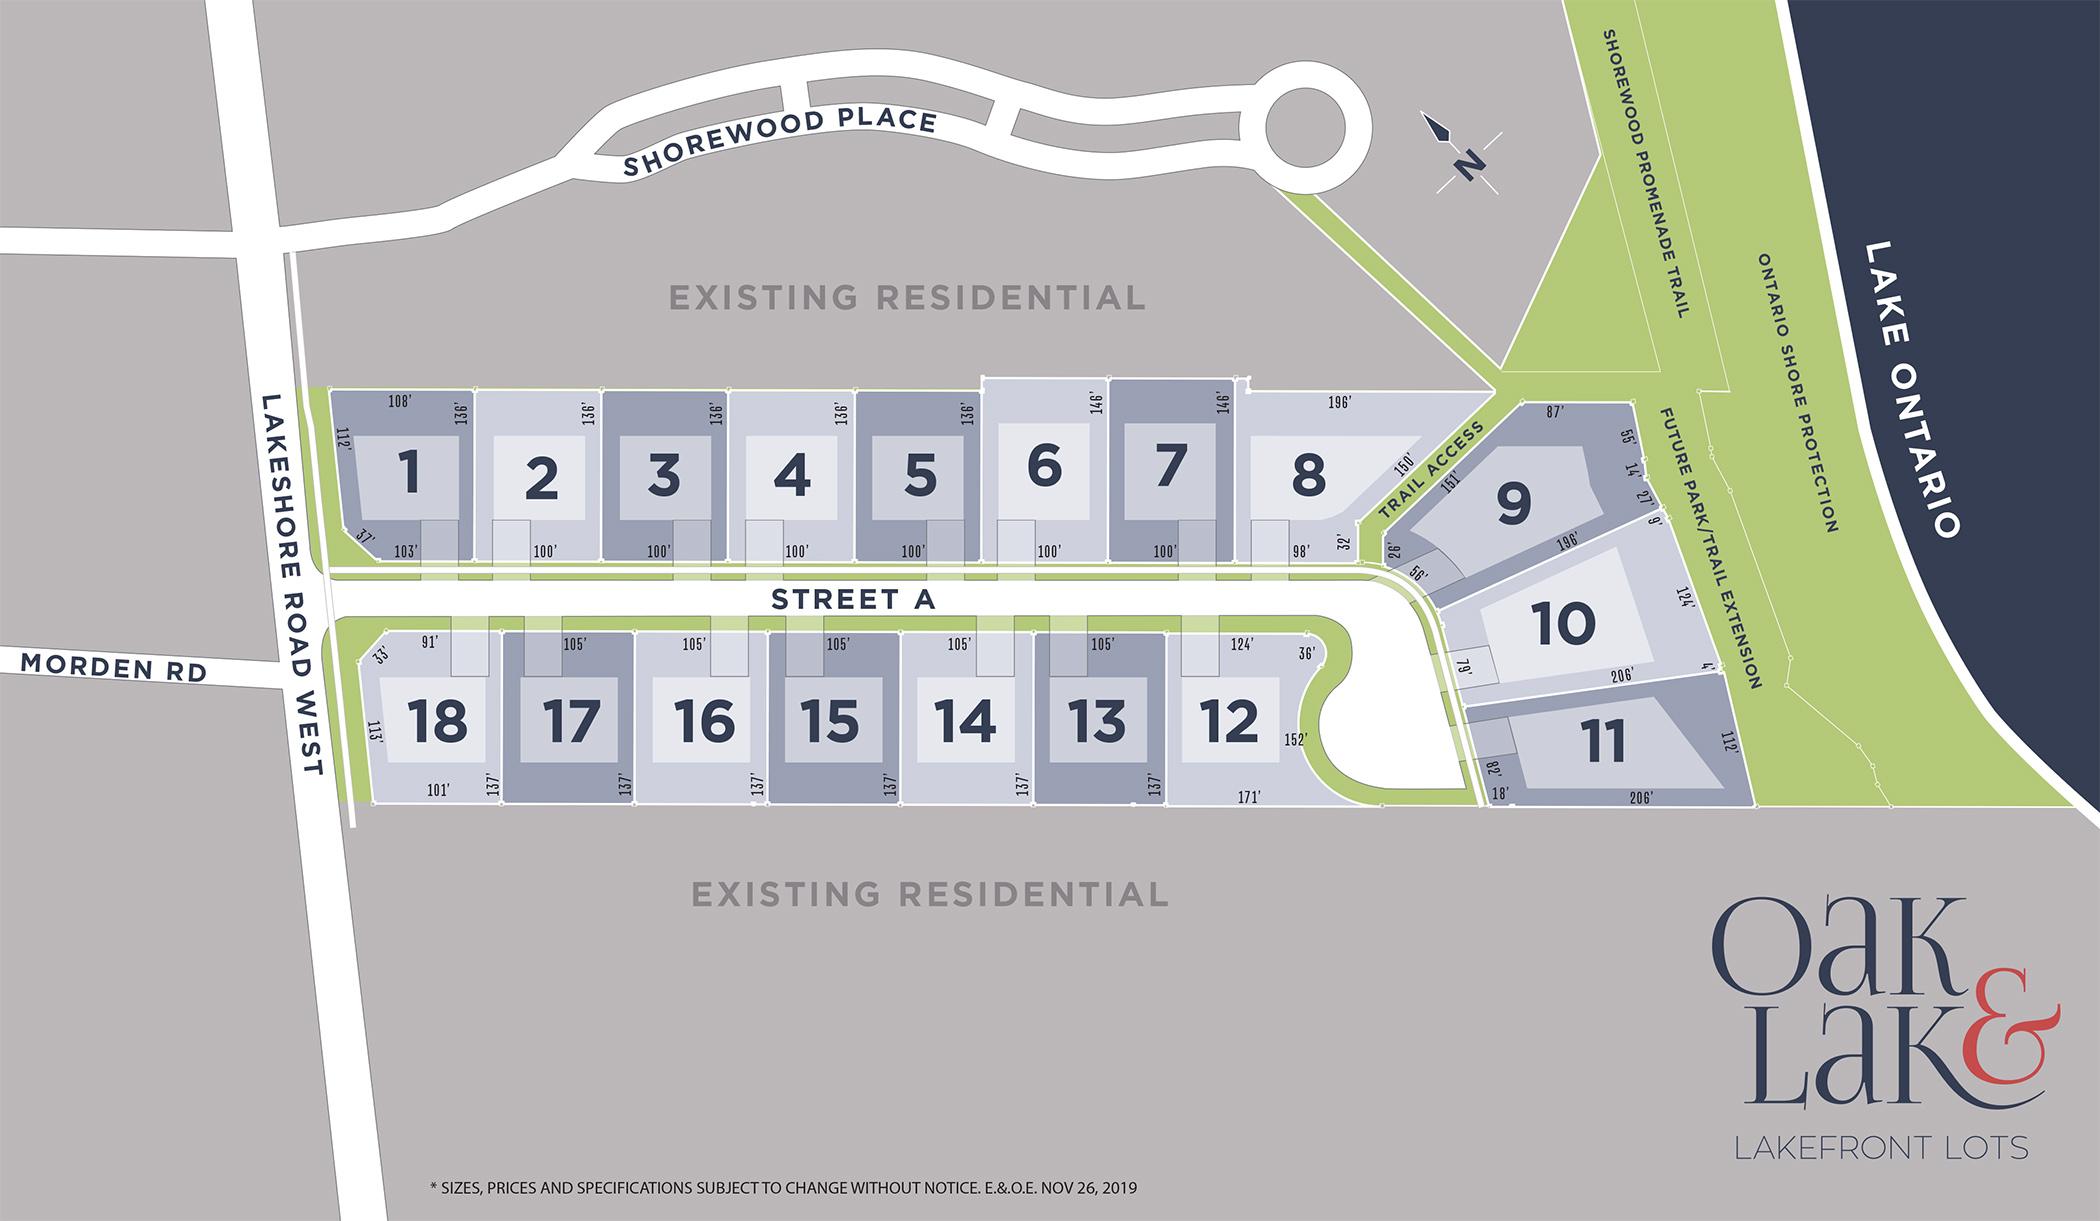 oak-and-lake-oakville-lakefront-homes-siteplan